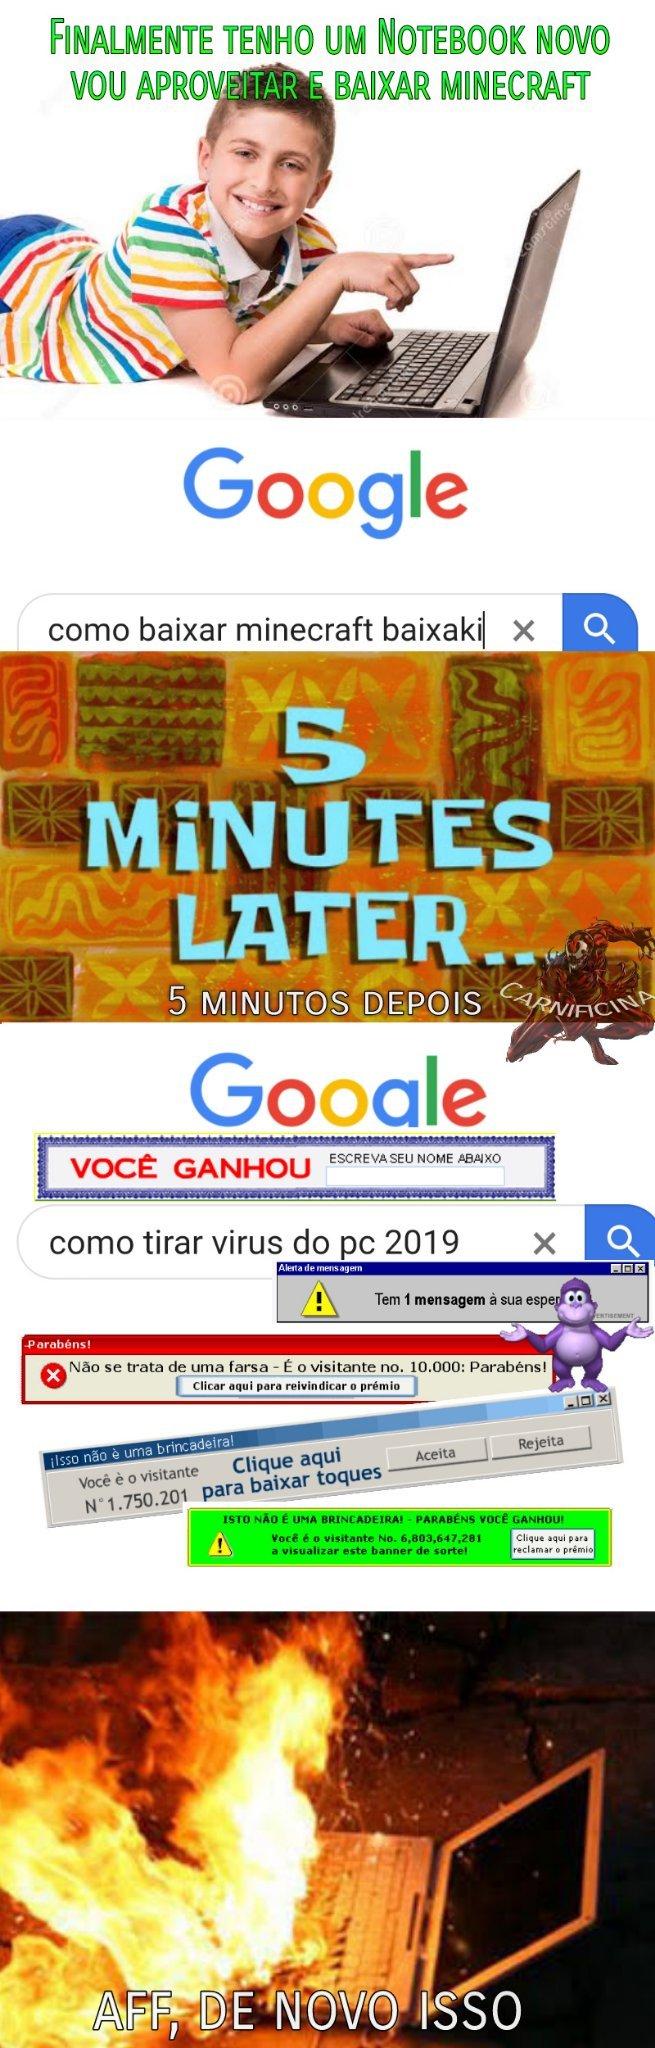 Hack pra fri fairus 2077 atualizado - meme